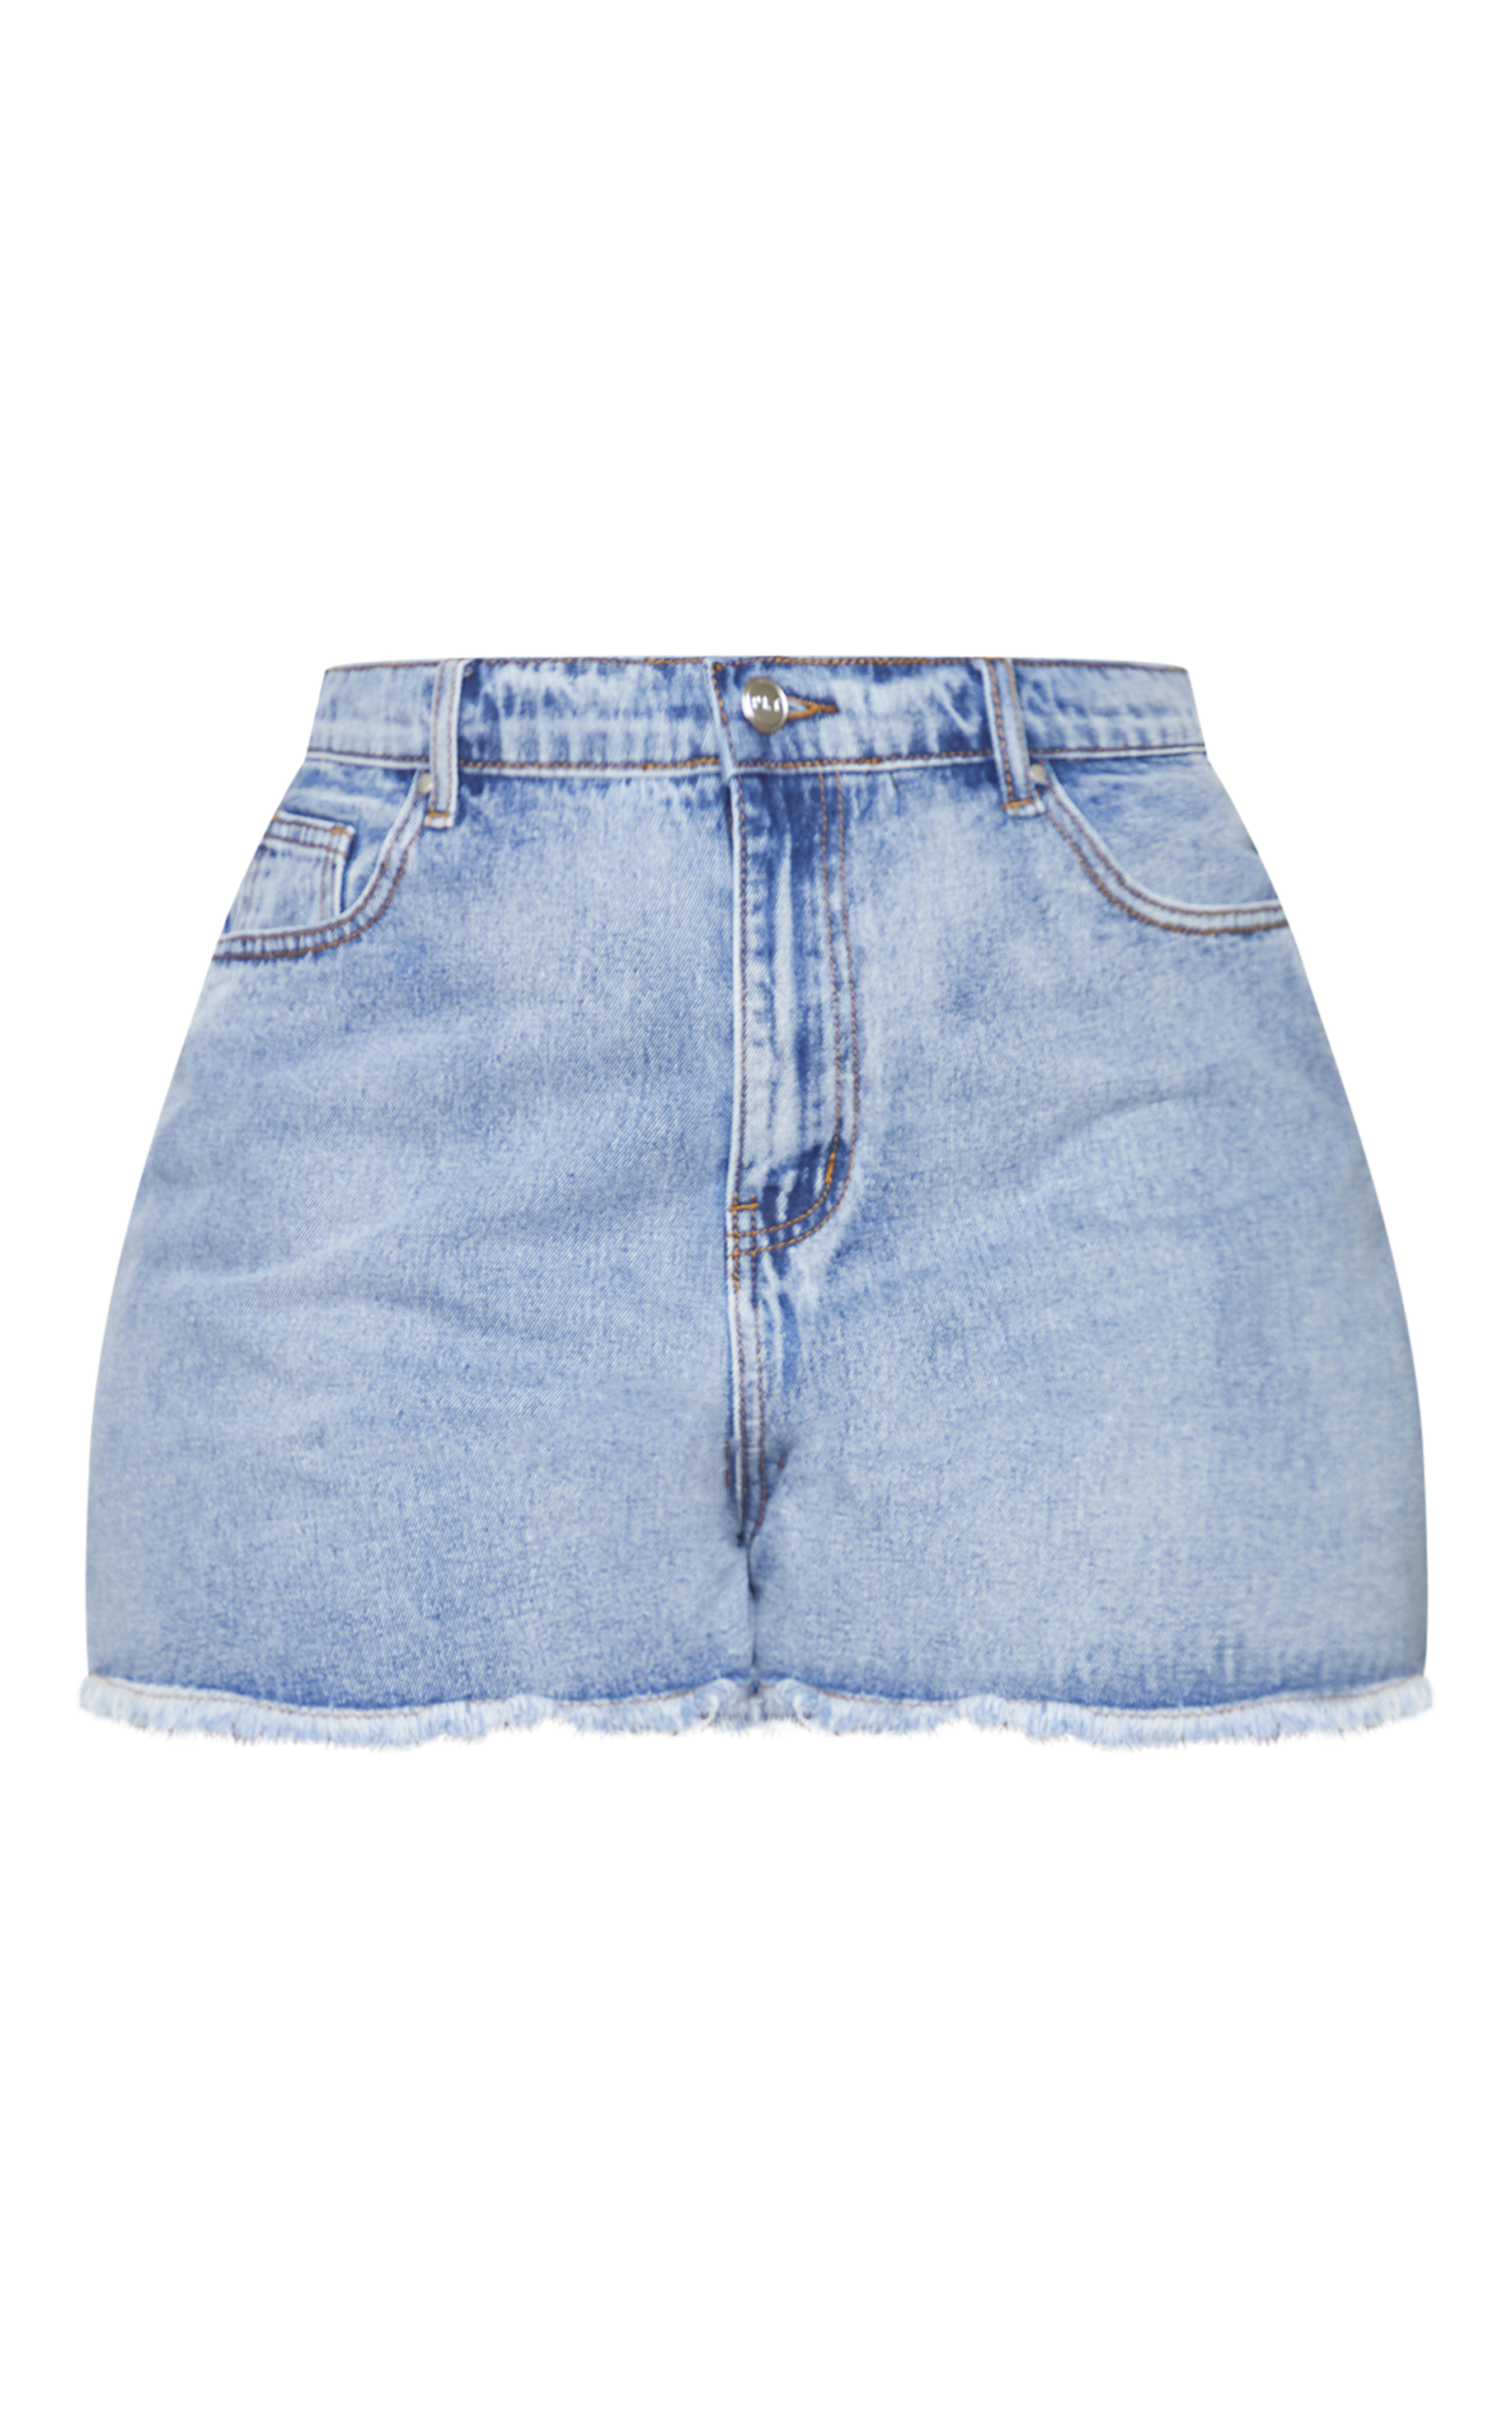 Plus Vintage High Waisted Denim Shorts 6